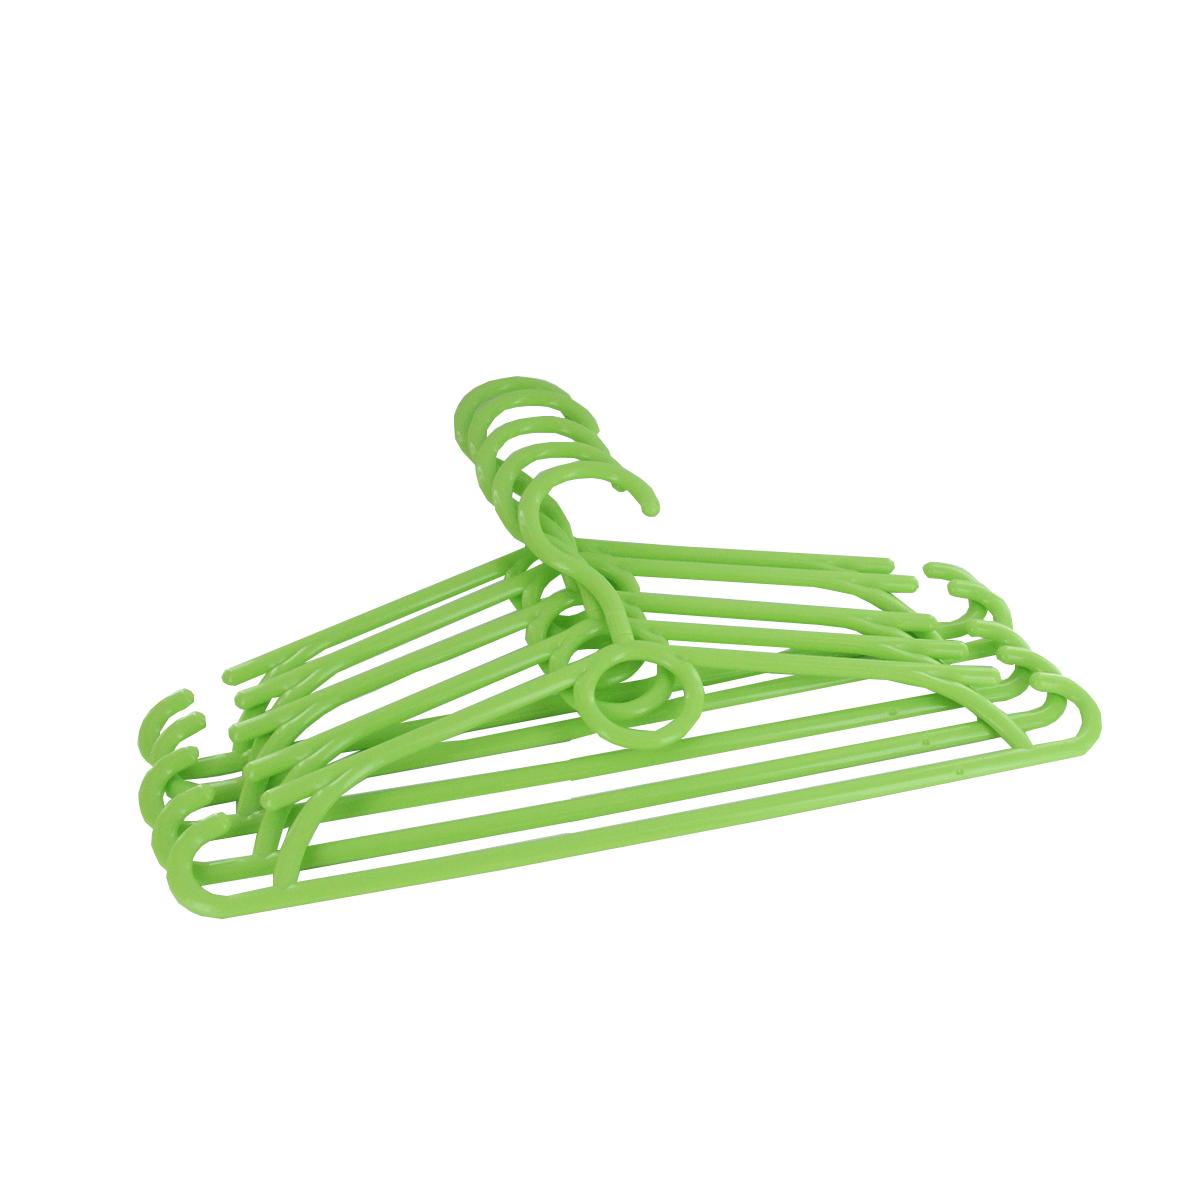 cintres plastique vert rangement v tements. Black Bedroom Furniture Sets. Home Design Ideas